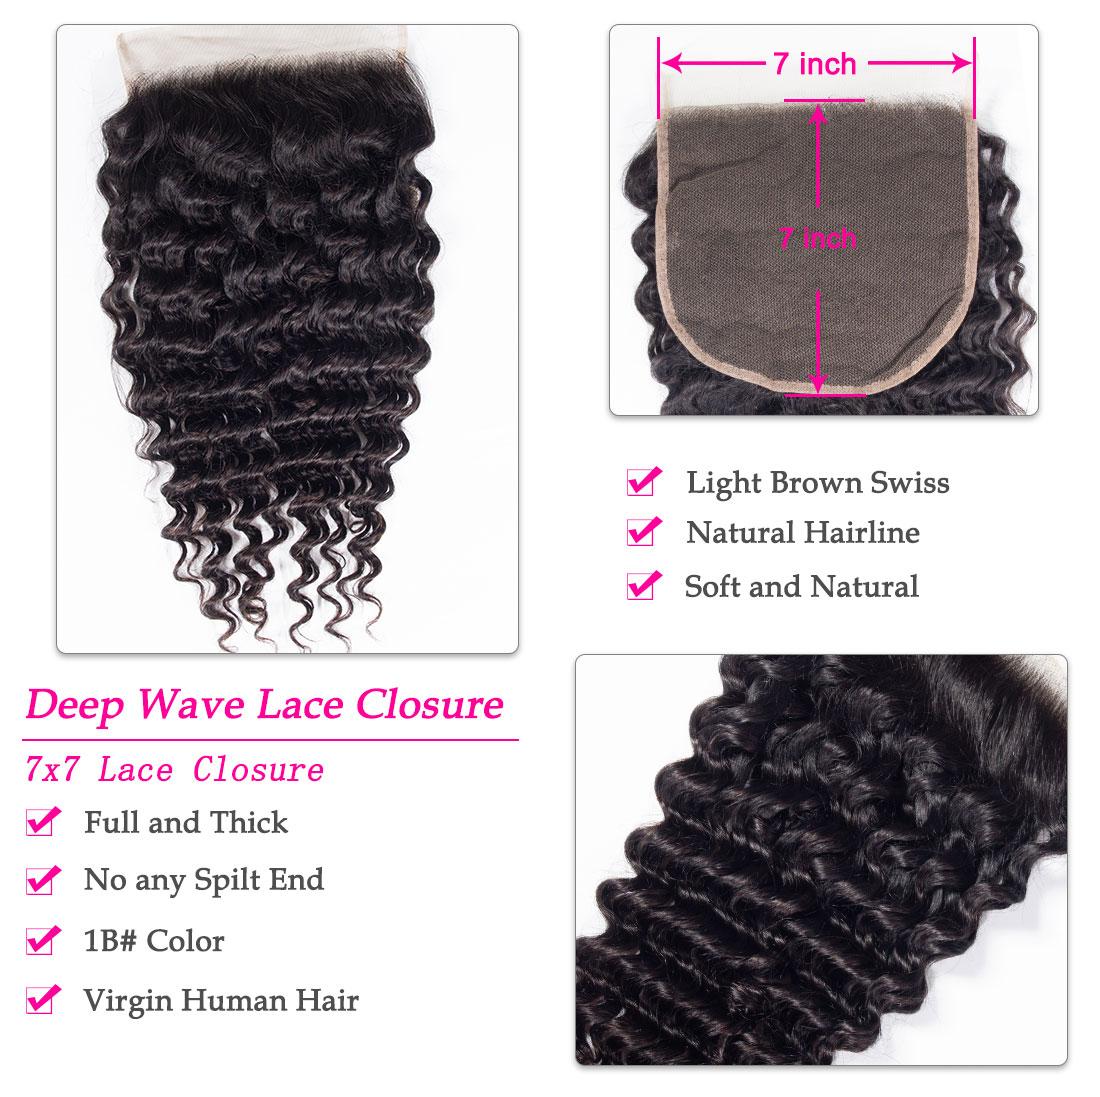 7x7 deep wave lace closure